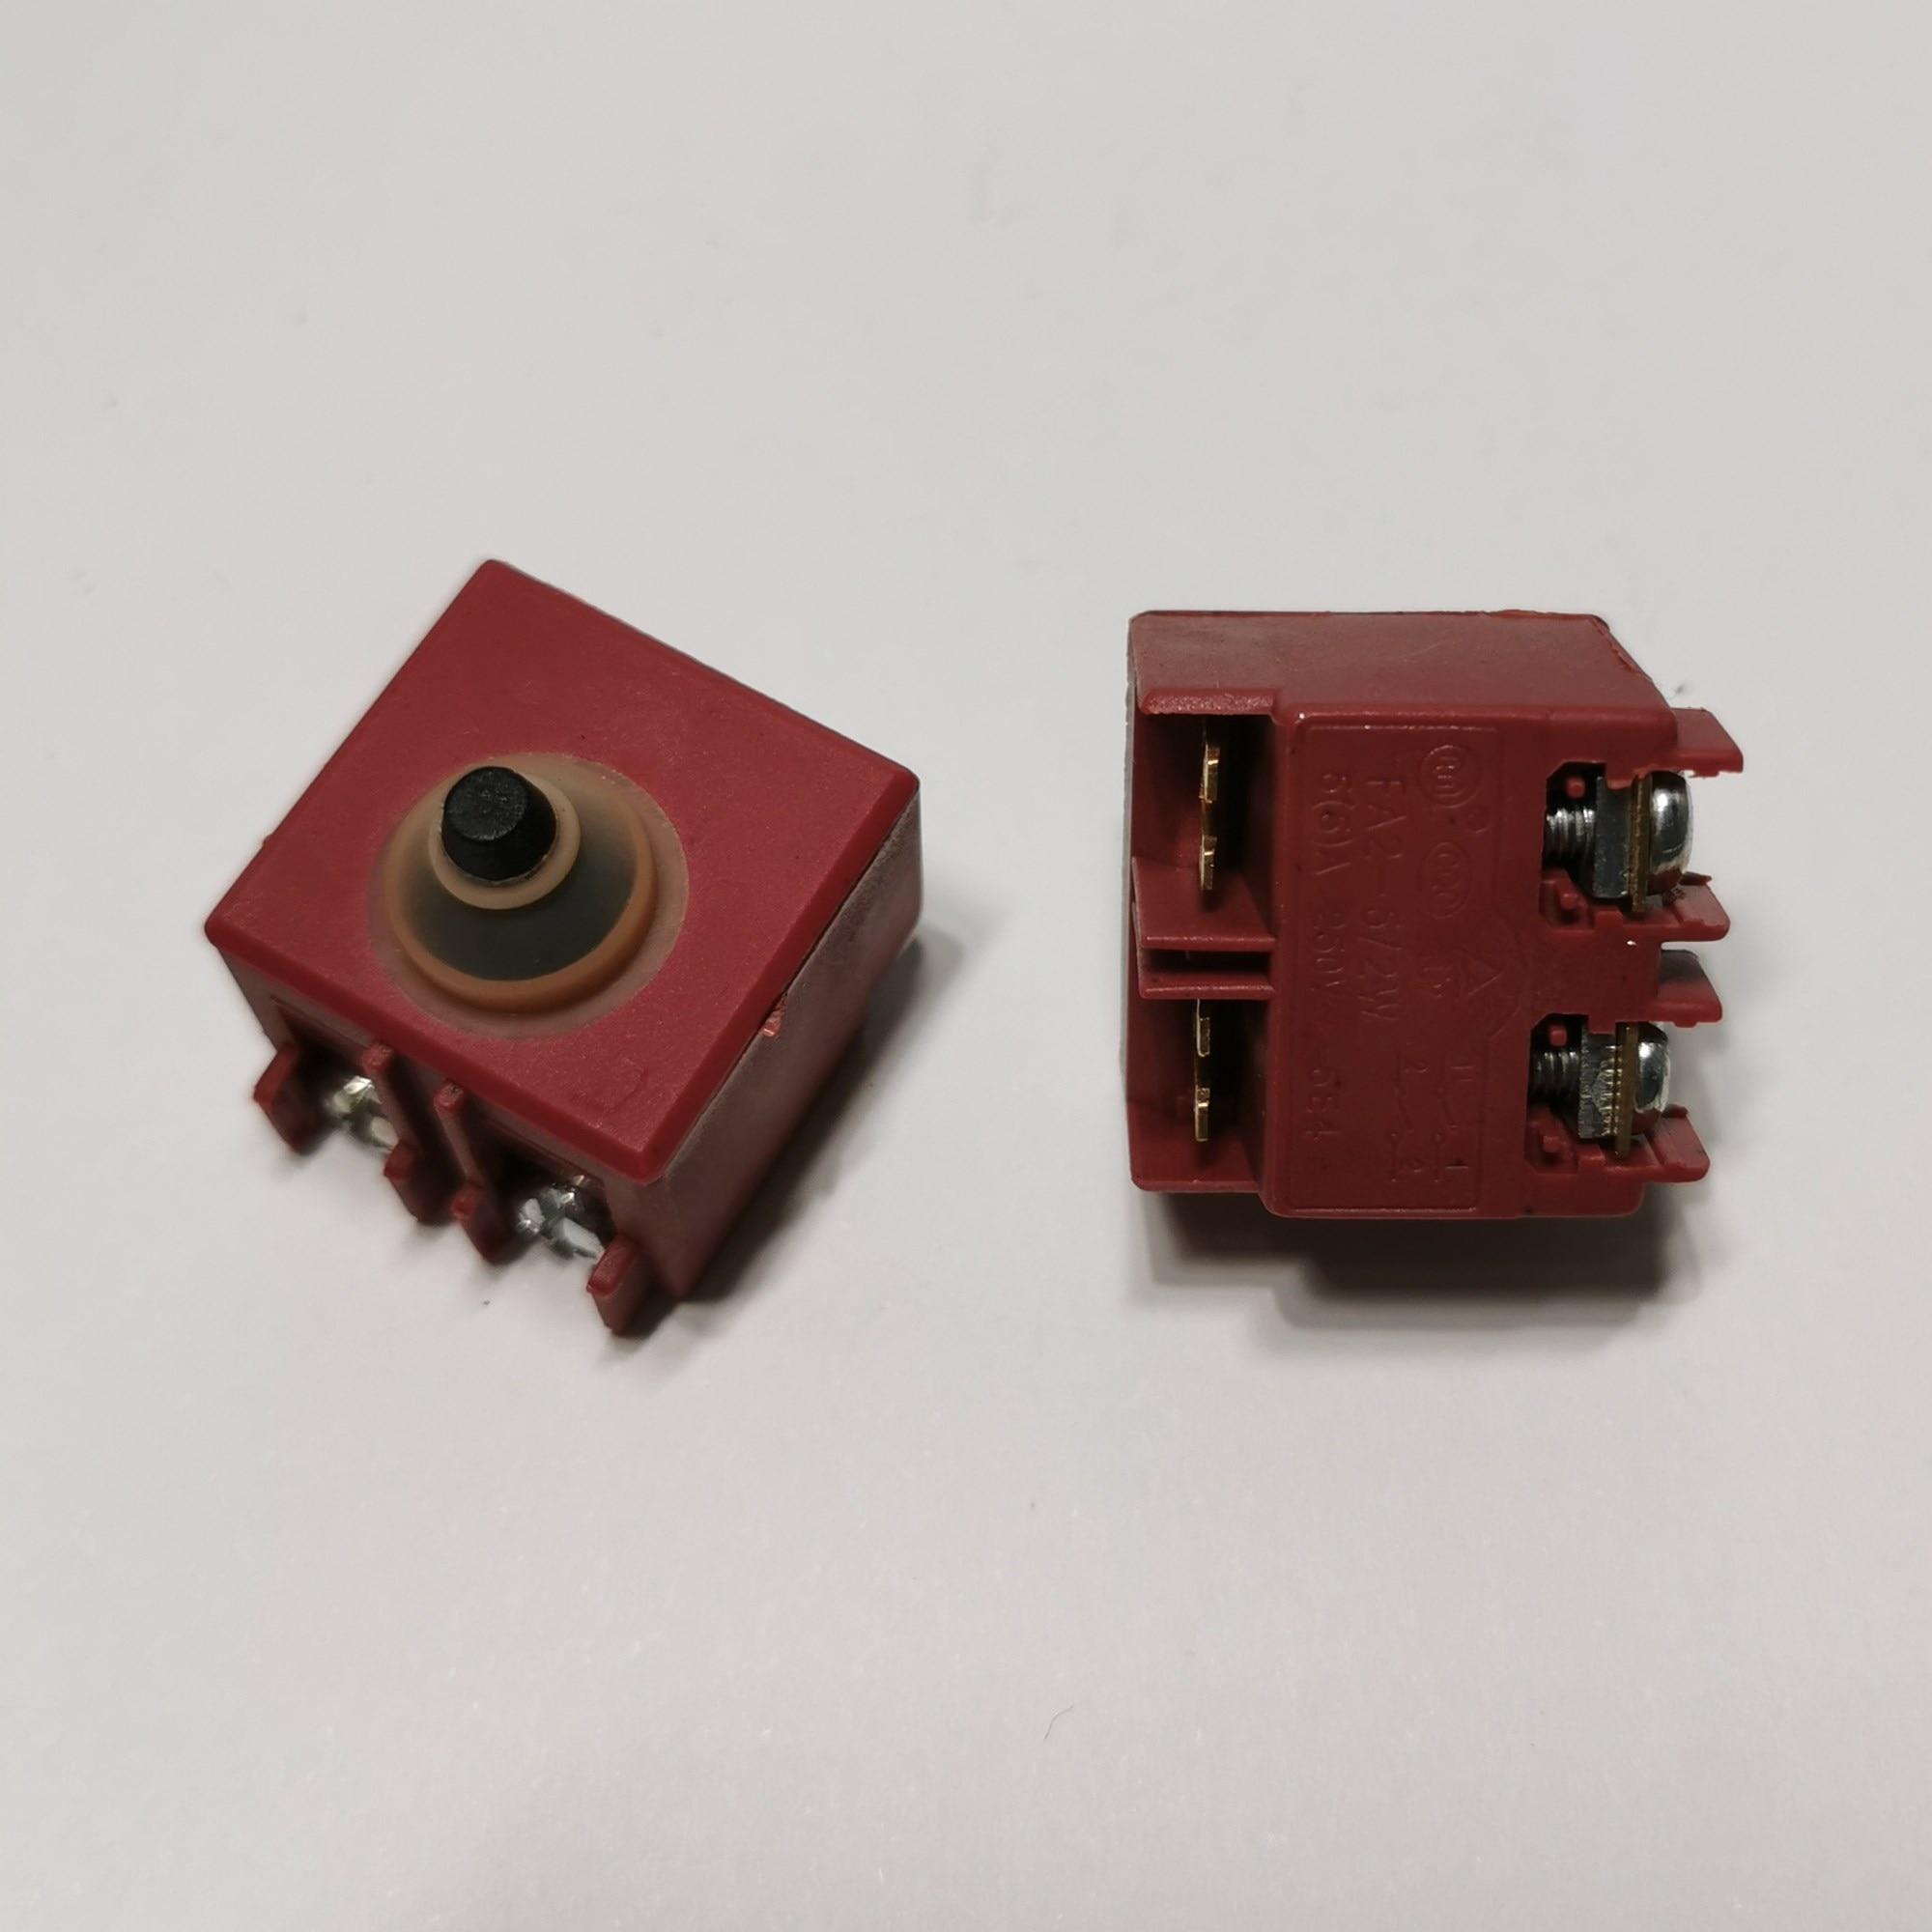 Switch 650560-8 DPX-2110-R Replacement For MAKITA GA5030 GA4530 9558NB 9558HN 9557NB 9557HN 9555NB 9555HN 9554HN 9558PB